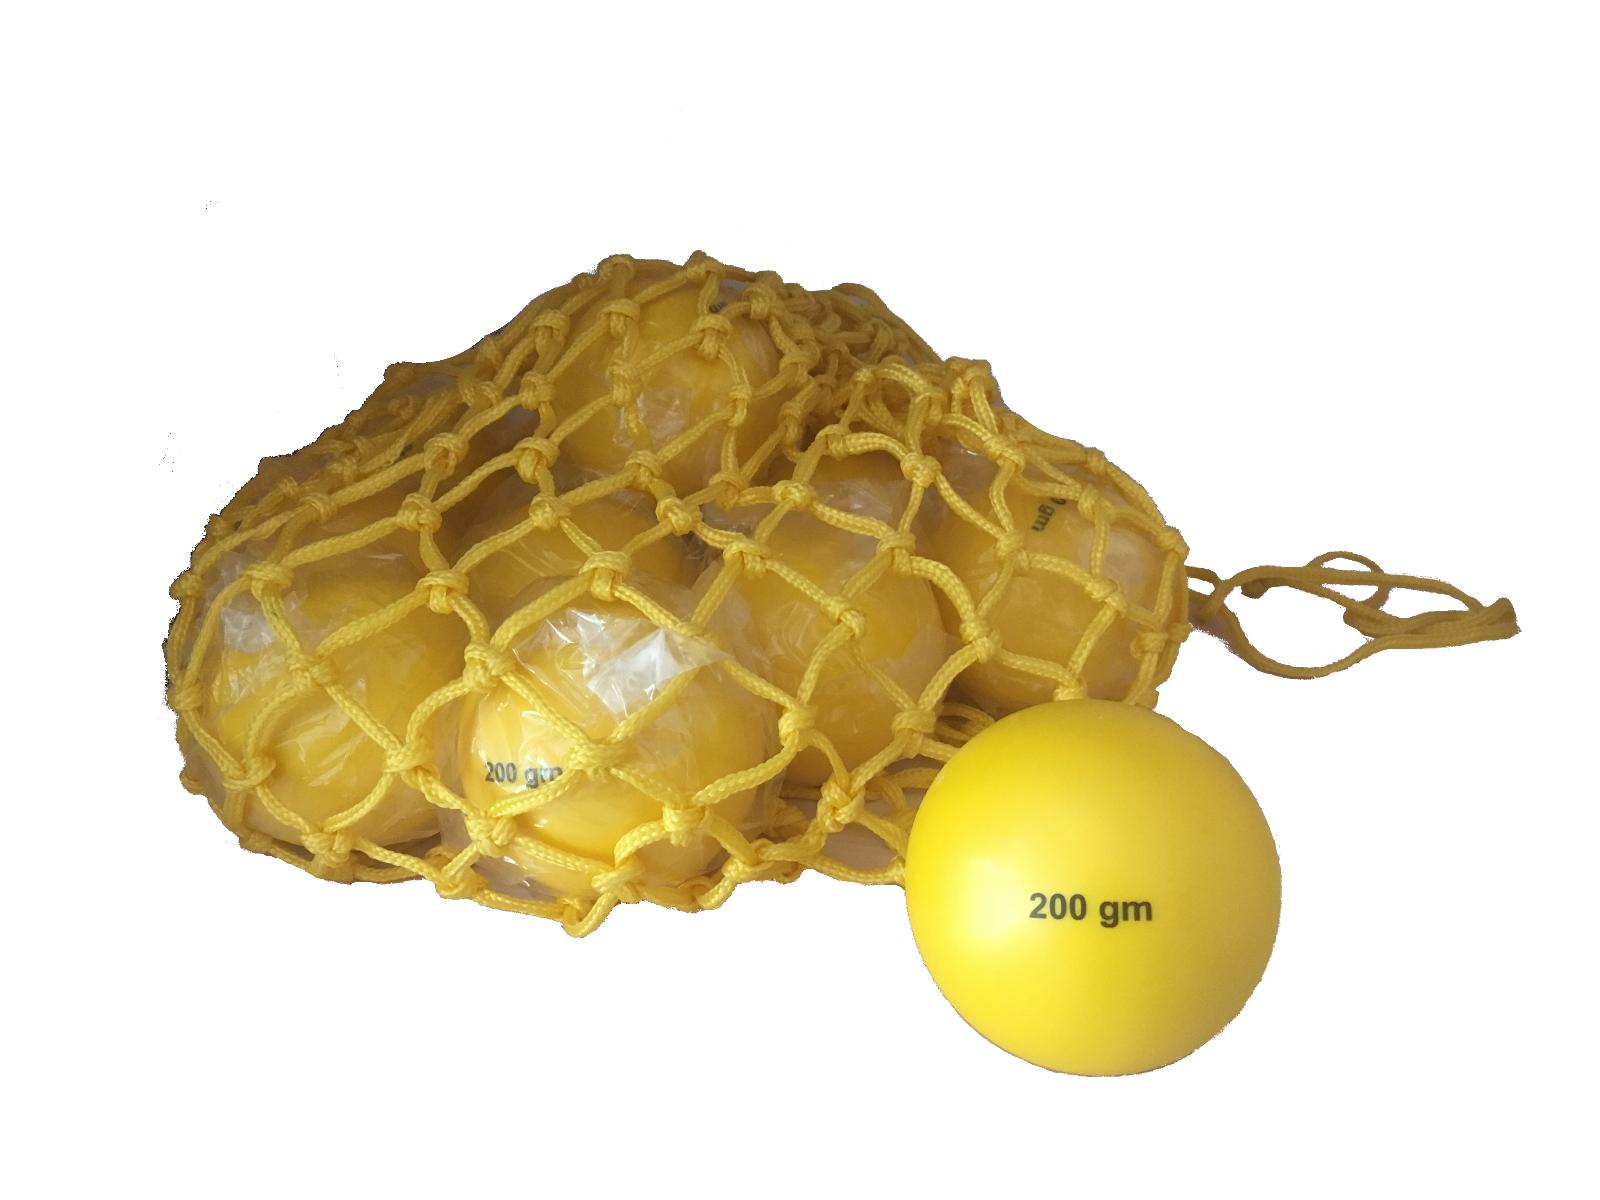 10 x Wurfball, Schlagball, Ballwurf, Leichtathletik ++ 80 80 80 g oder 200 g ++ 2b9dcb